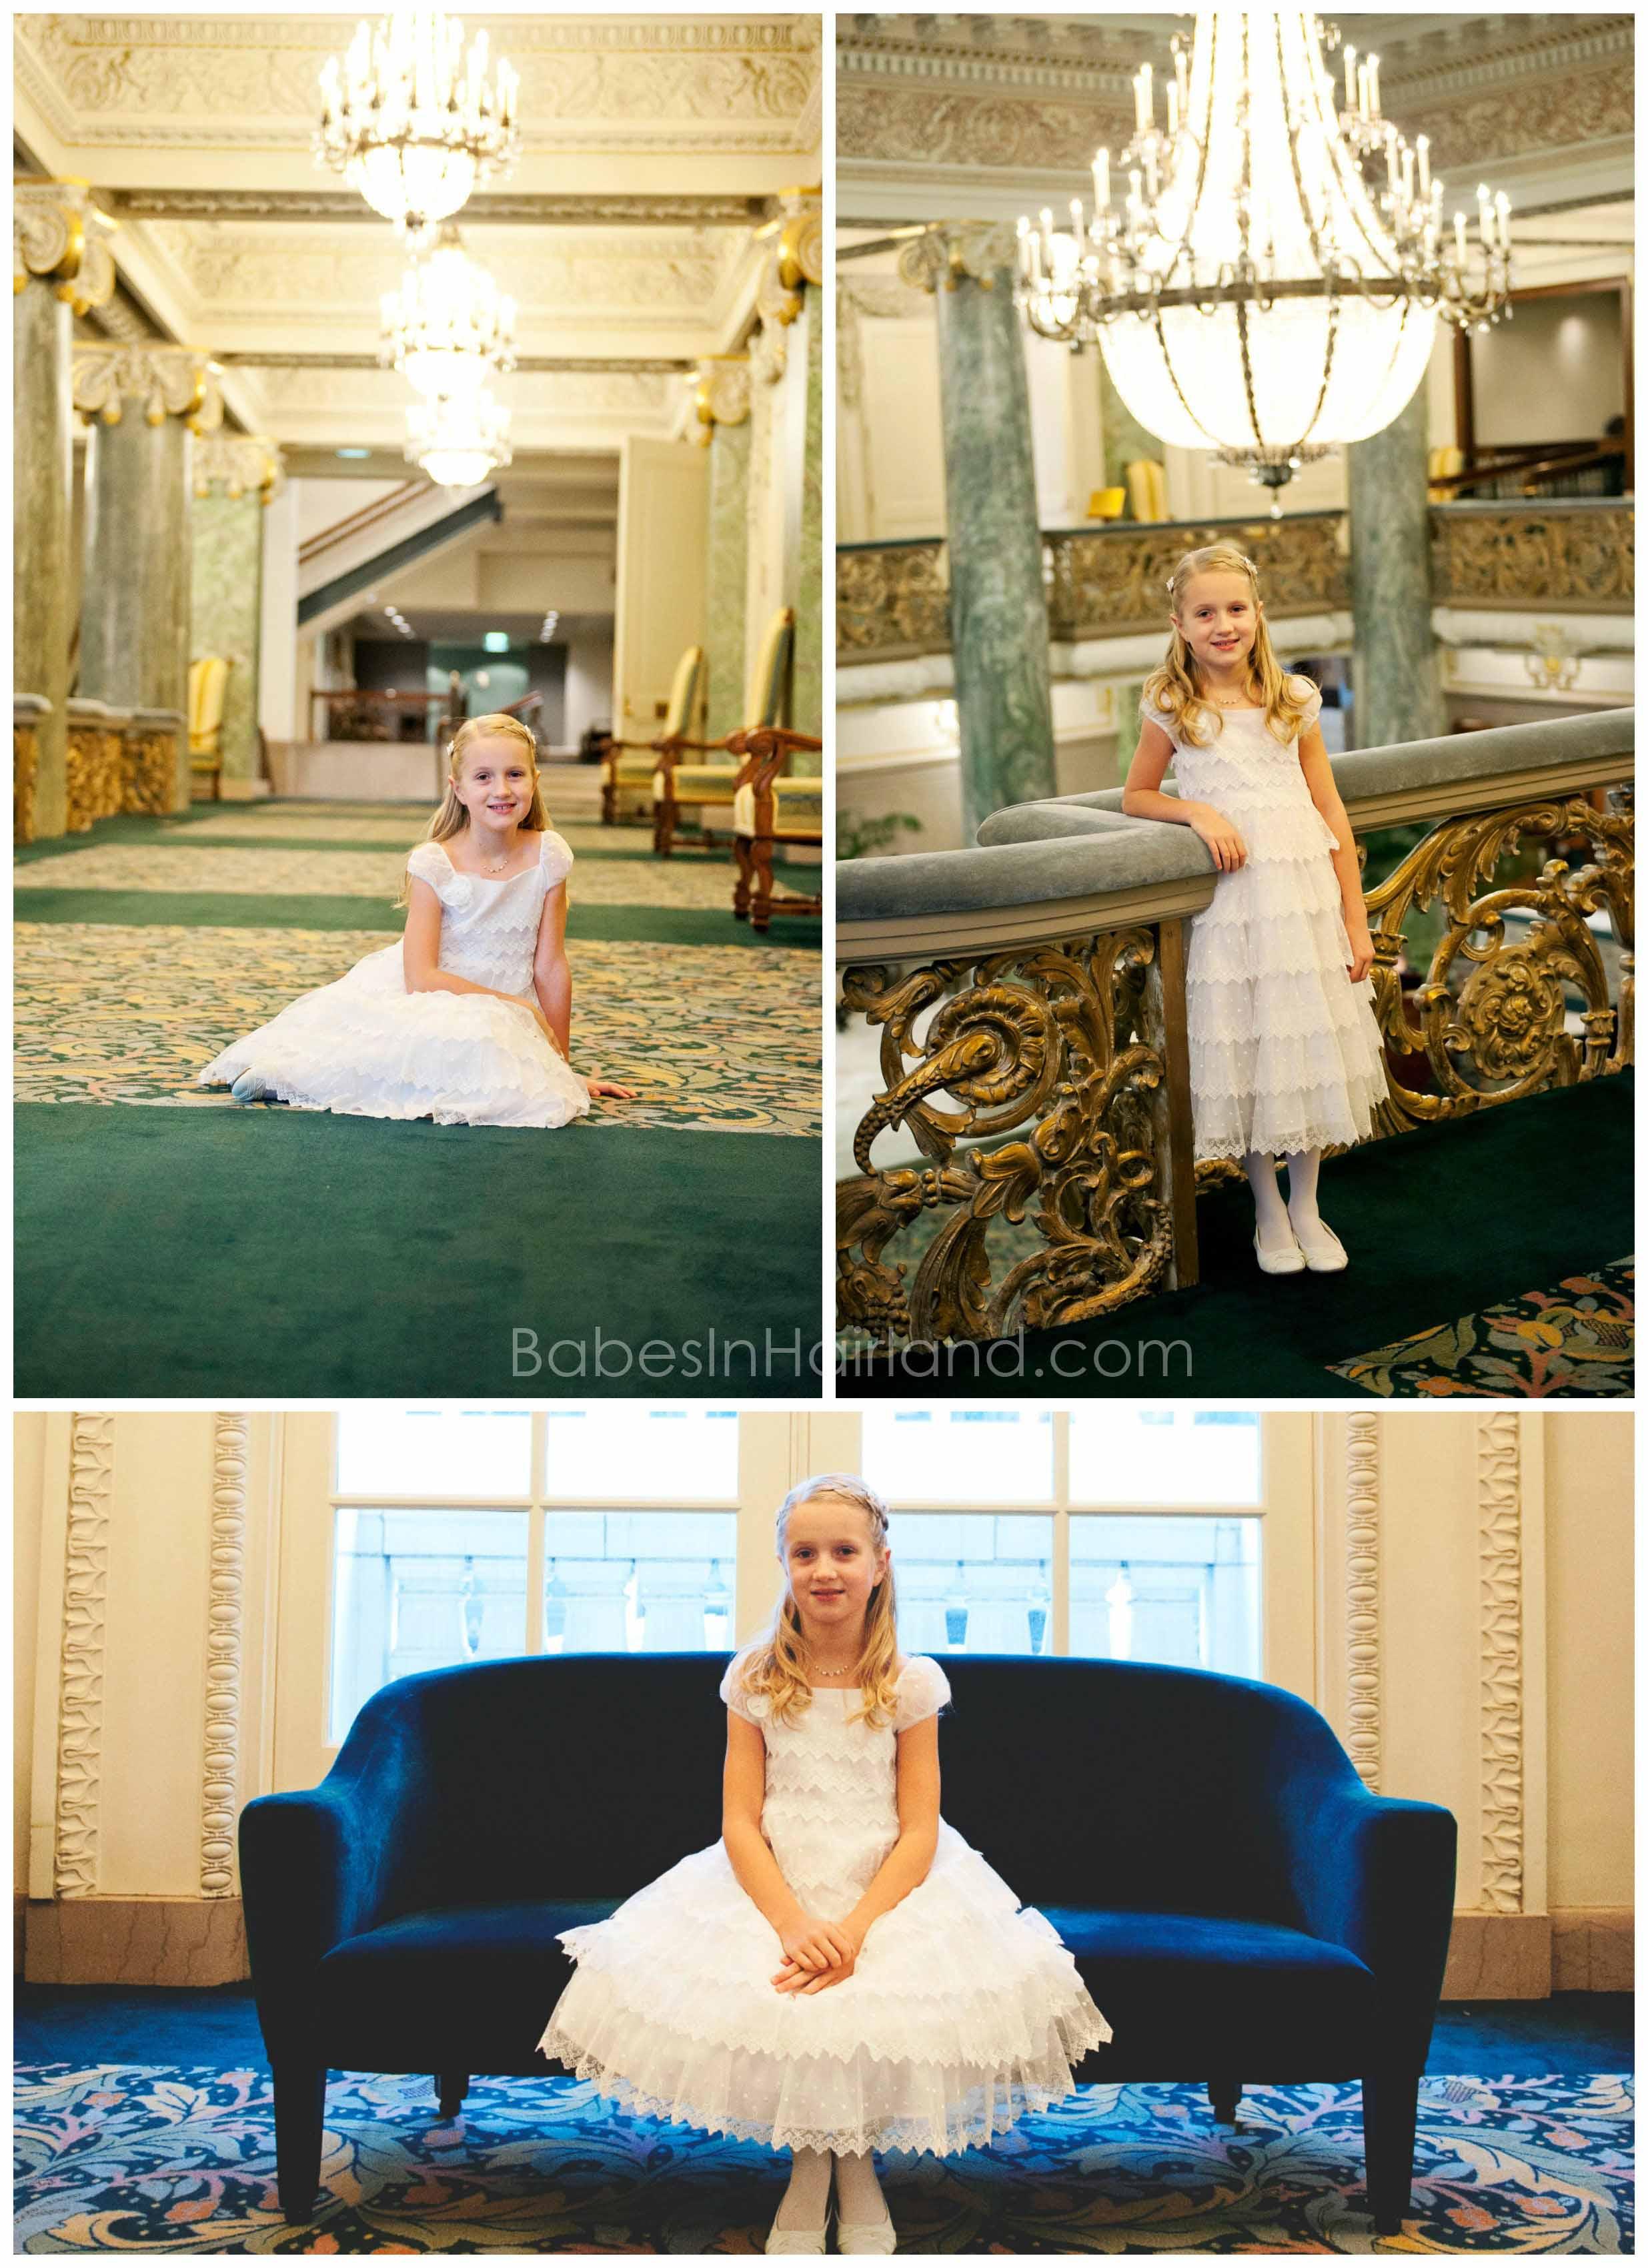 Baptism Dress from White Elegance - BabesInHairland.com #hair #frenchbraid #baptism #lds #mormon